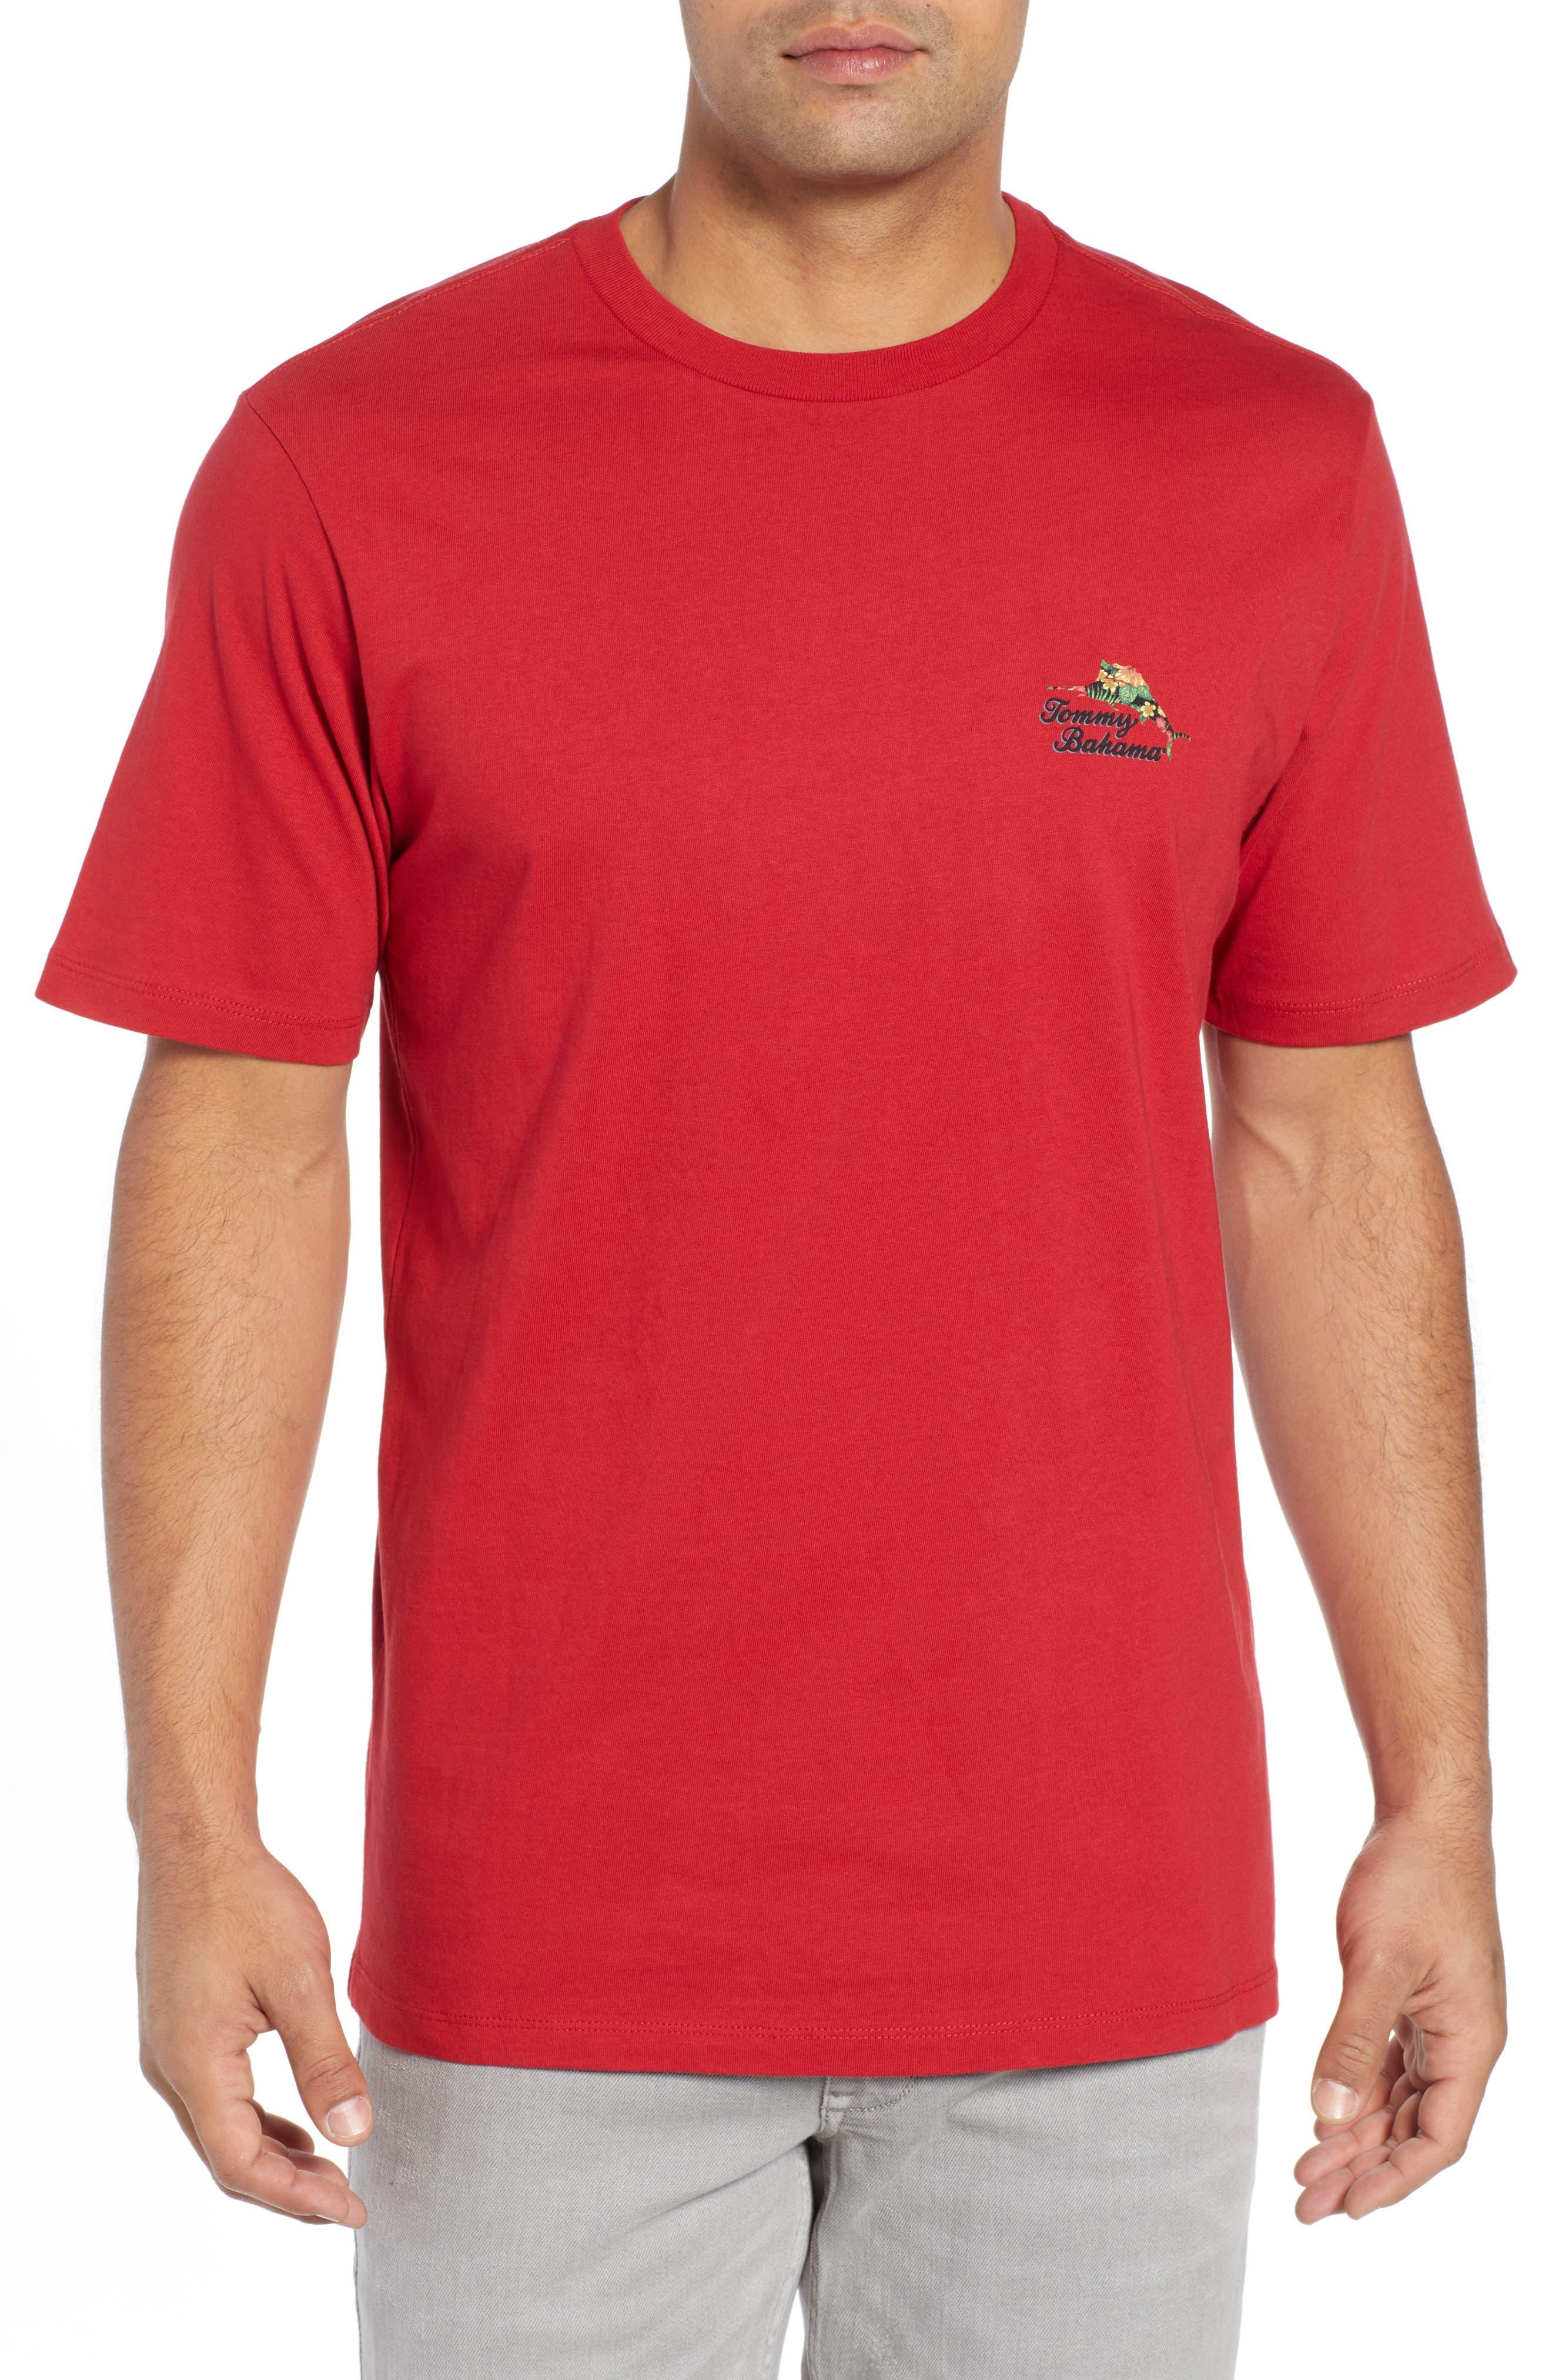 TOMMY BAHAMA Alo-Ho Ho-Ha Graphic T-Shirt, Main, color, SCOOTER RED